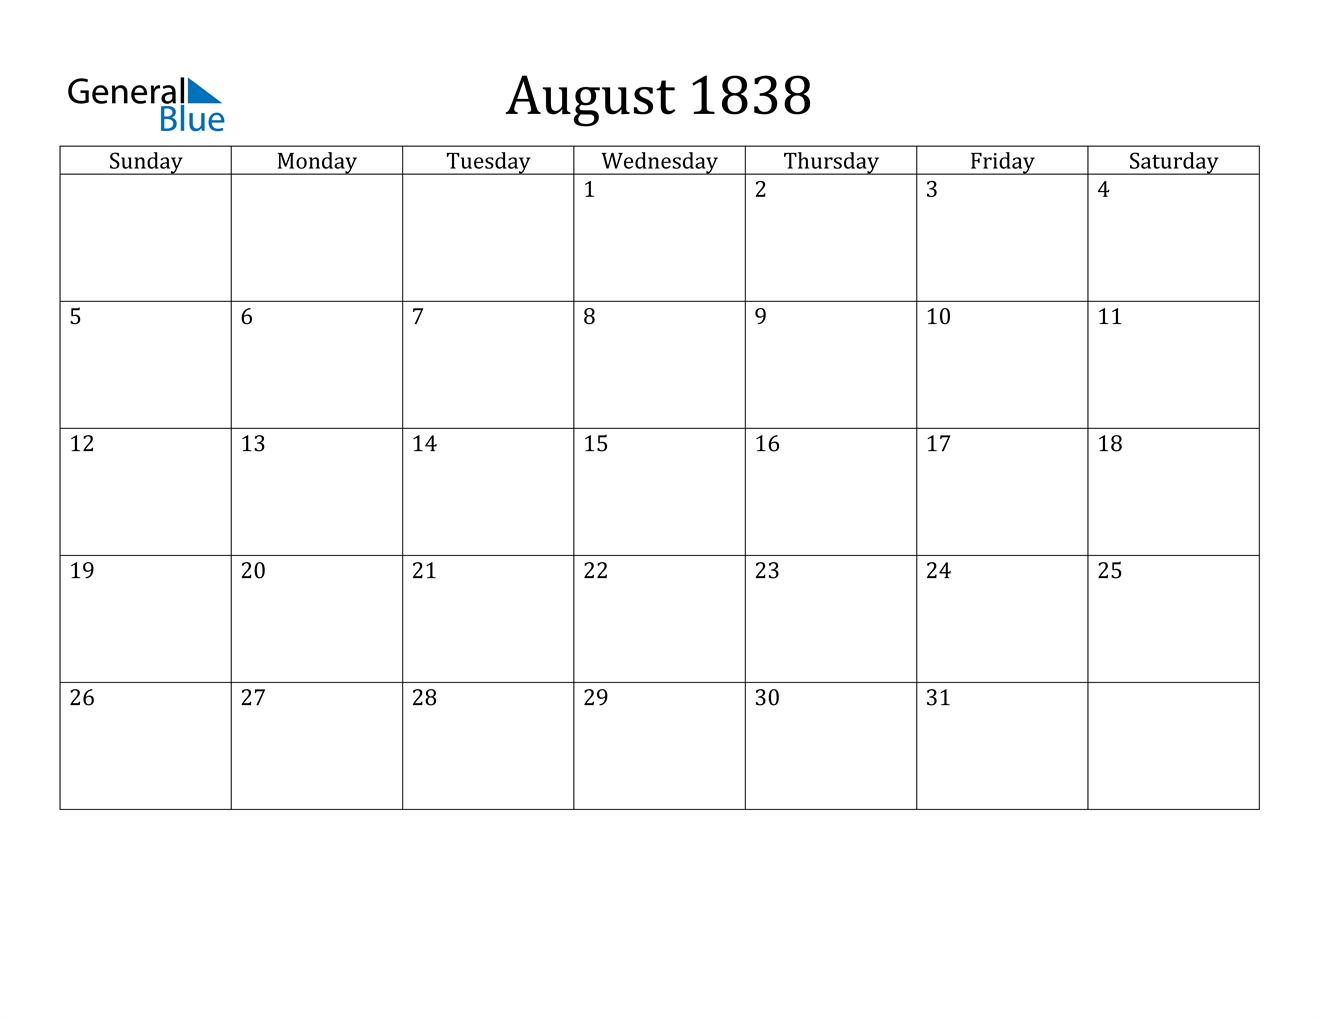 Image of August 1838 Calendar